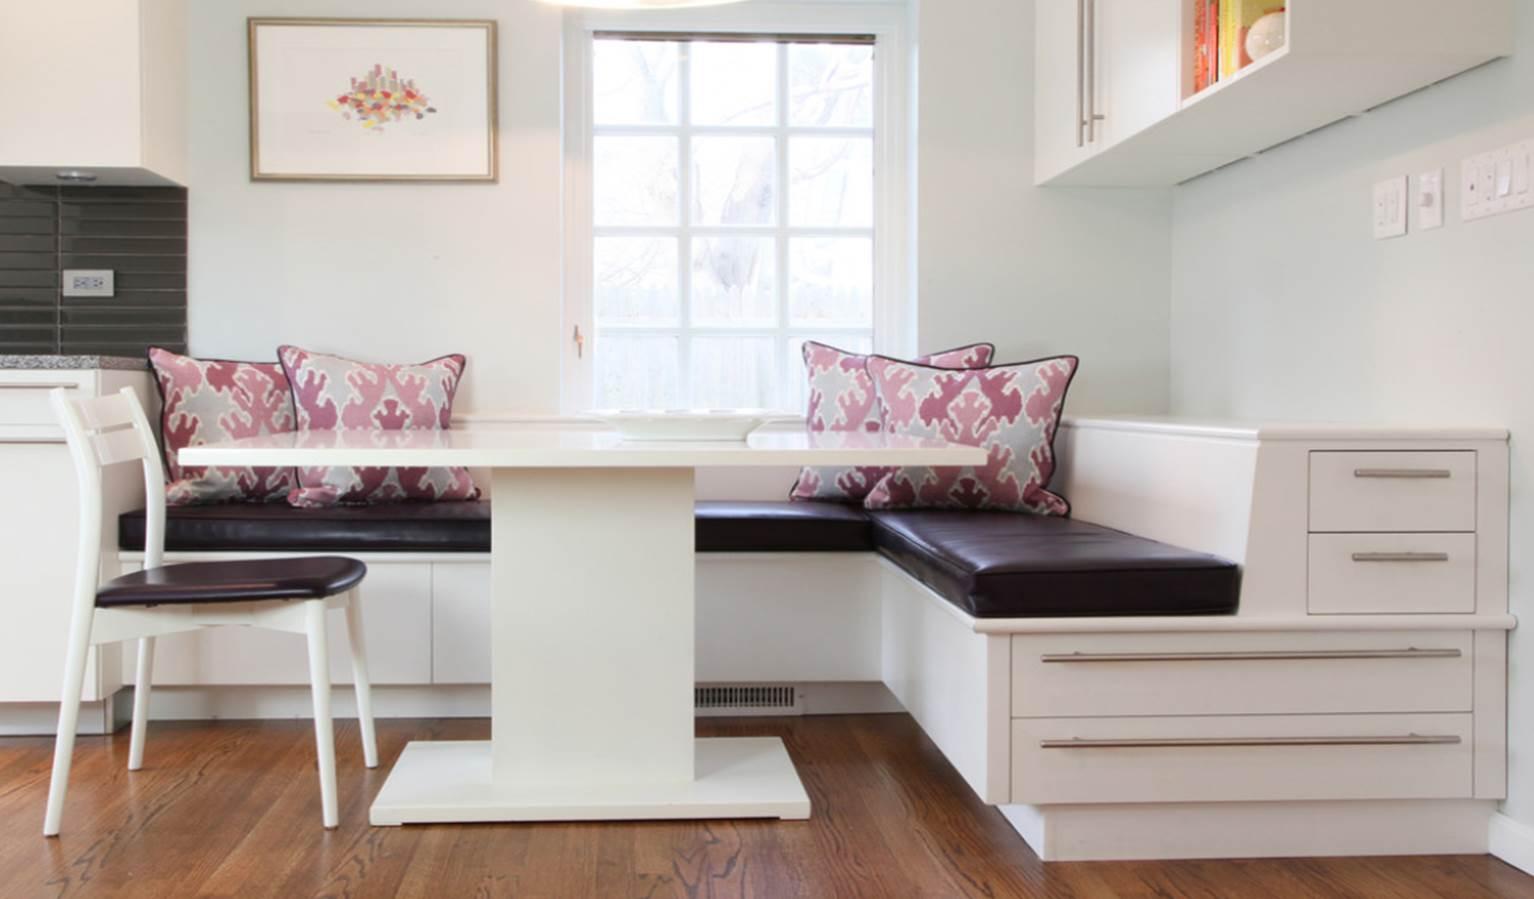 Banquette Built-In « Corinne Gail